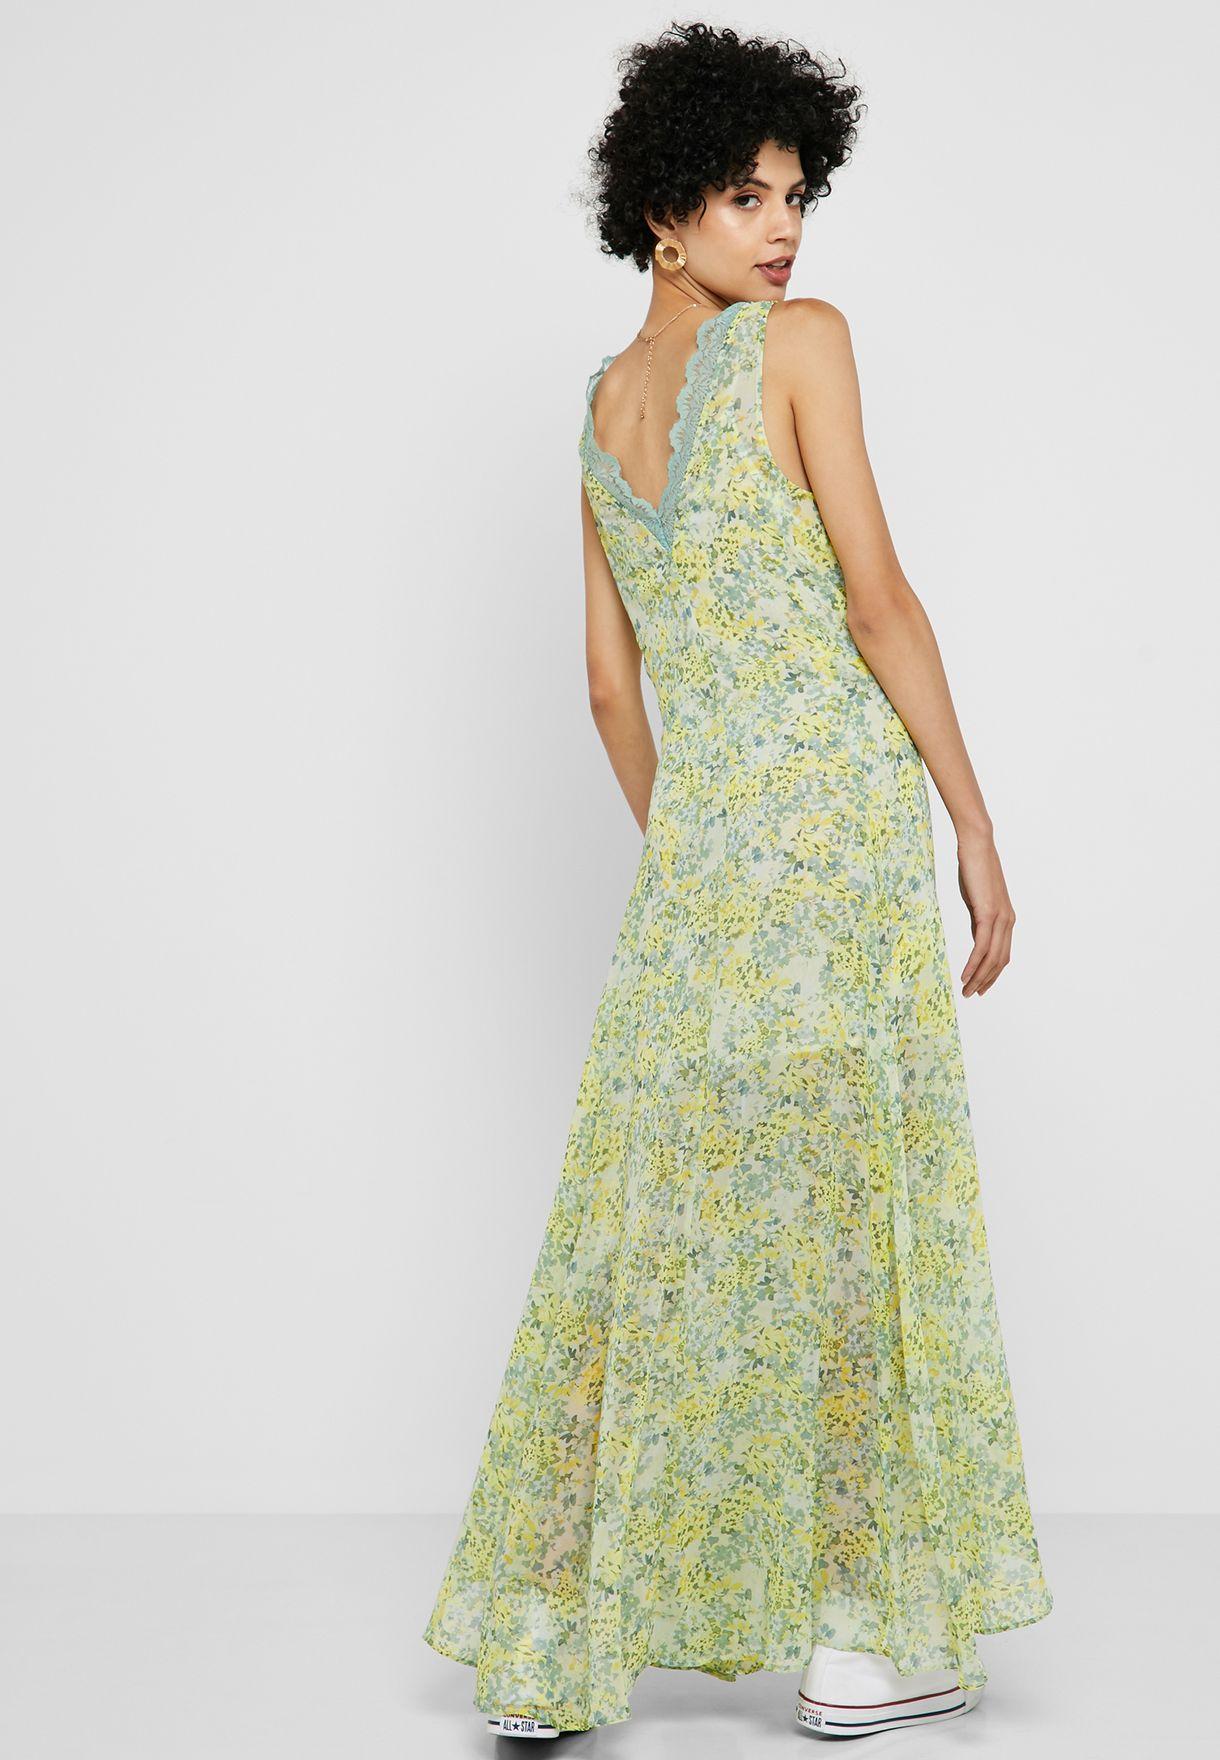 MANGO Scallop Trim Floral Print Dress - Women Clothing TrB9R